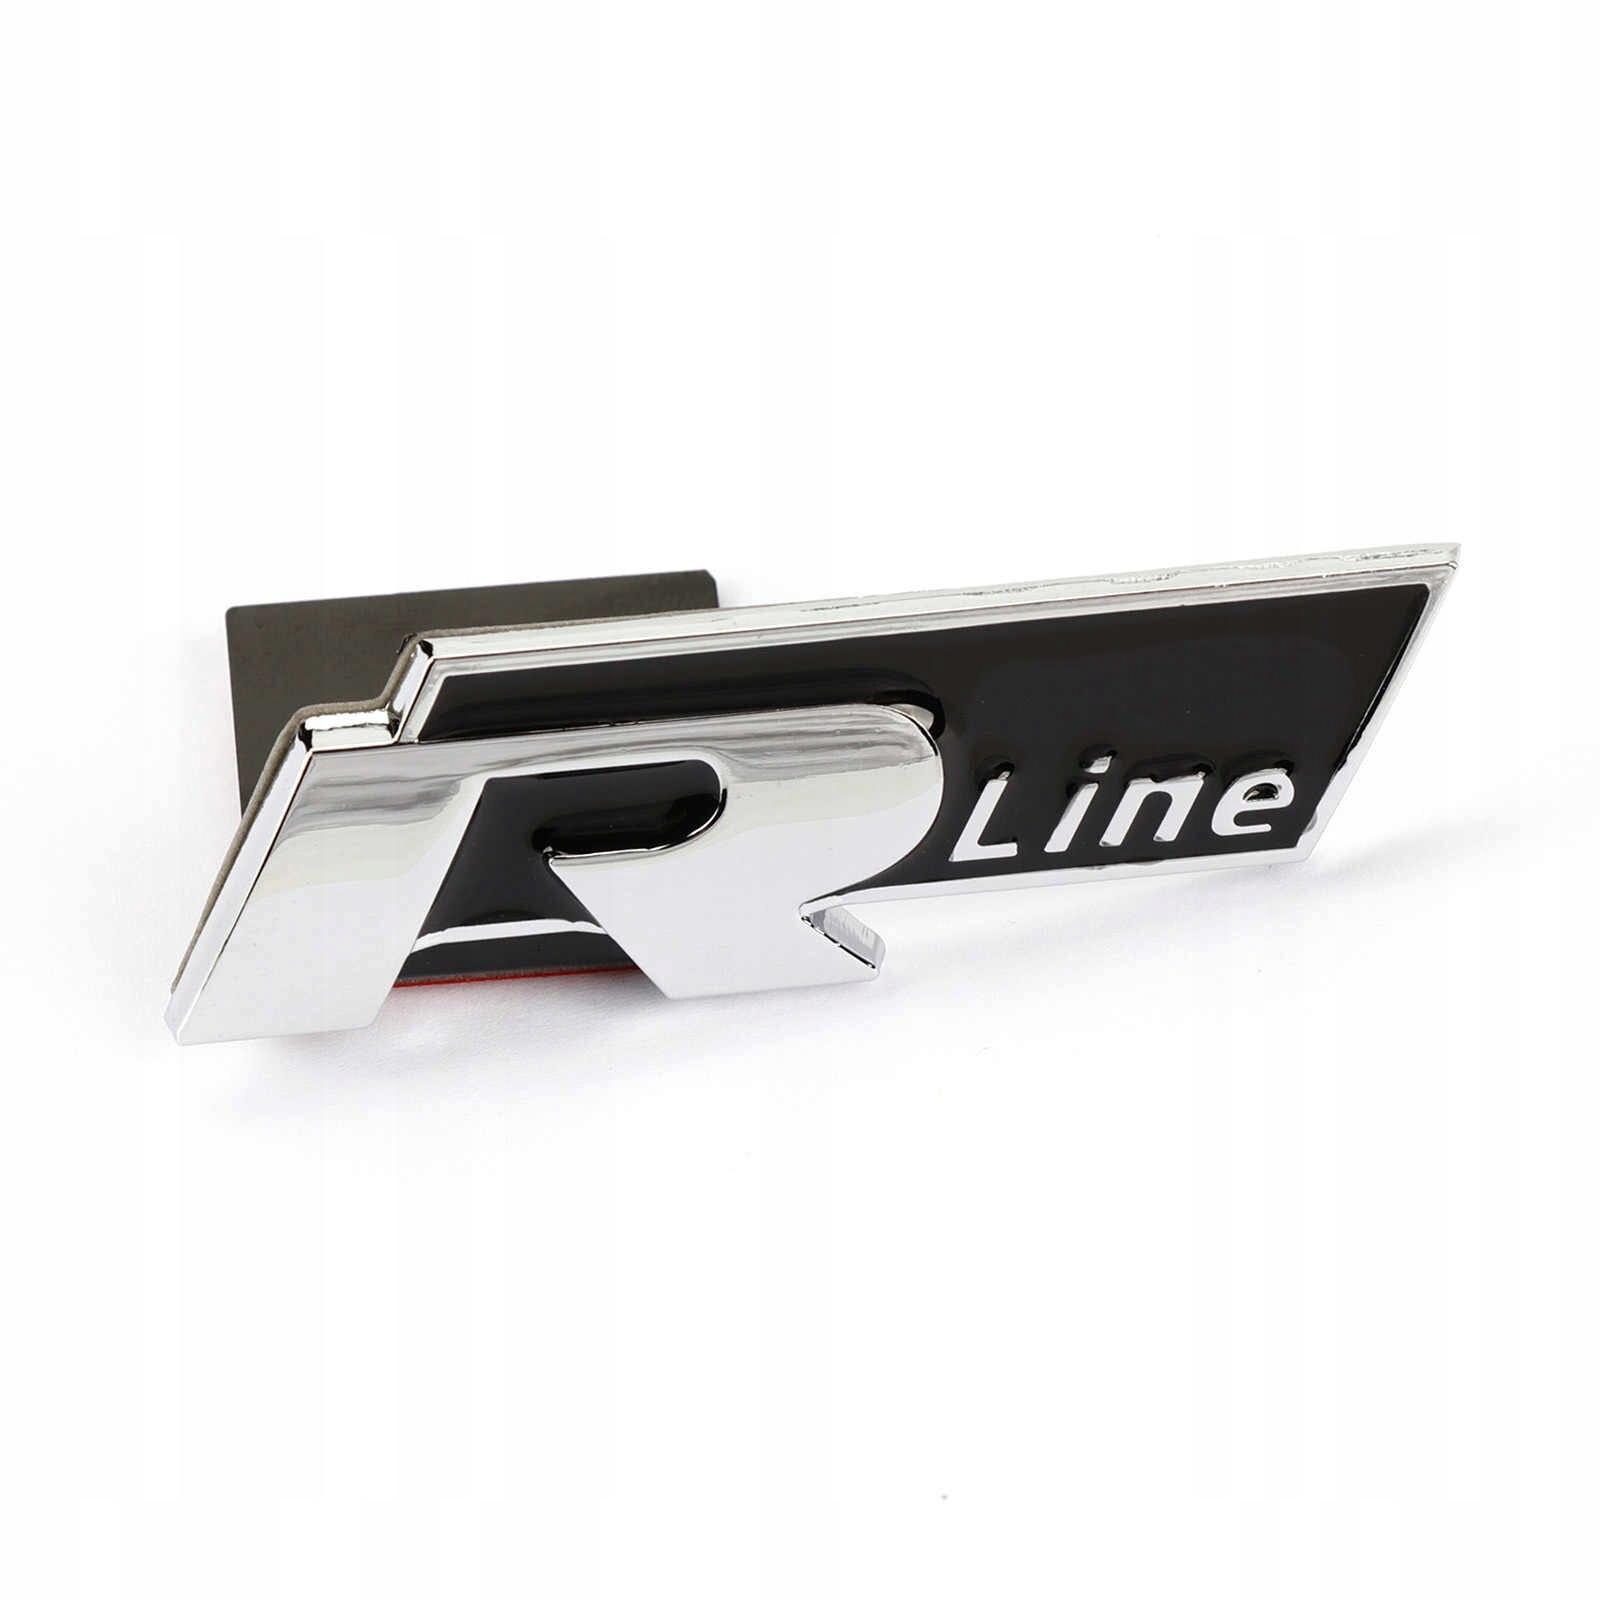 C07 ЗНАЧОК ЭМБЛЕМА VW RLINE R LINE W GRILL ATRAP